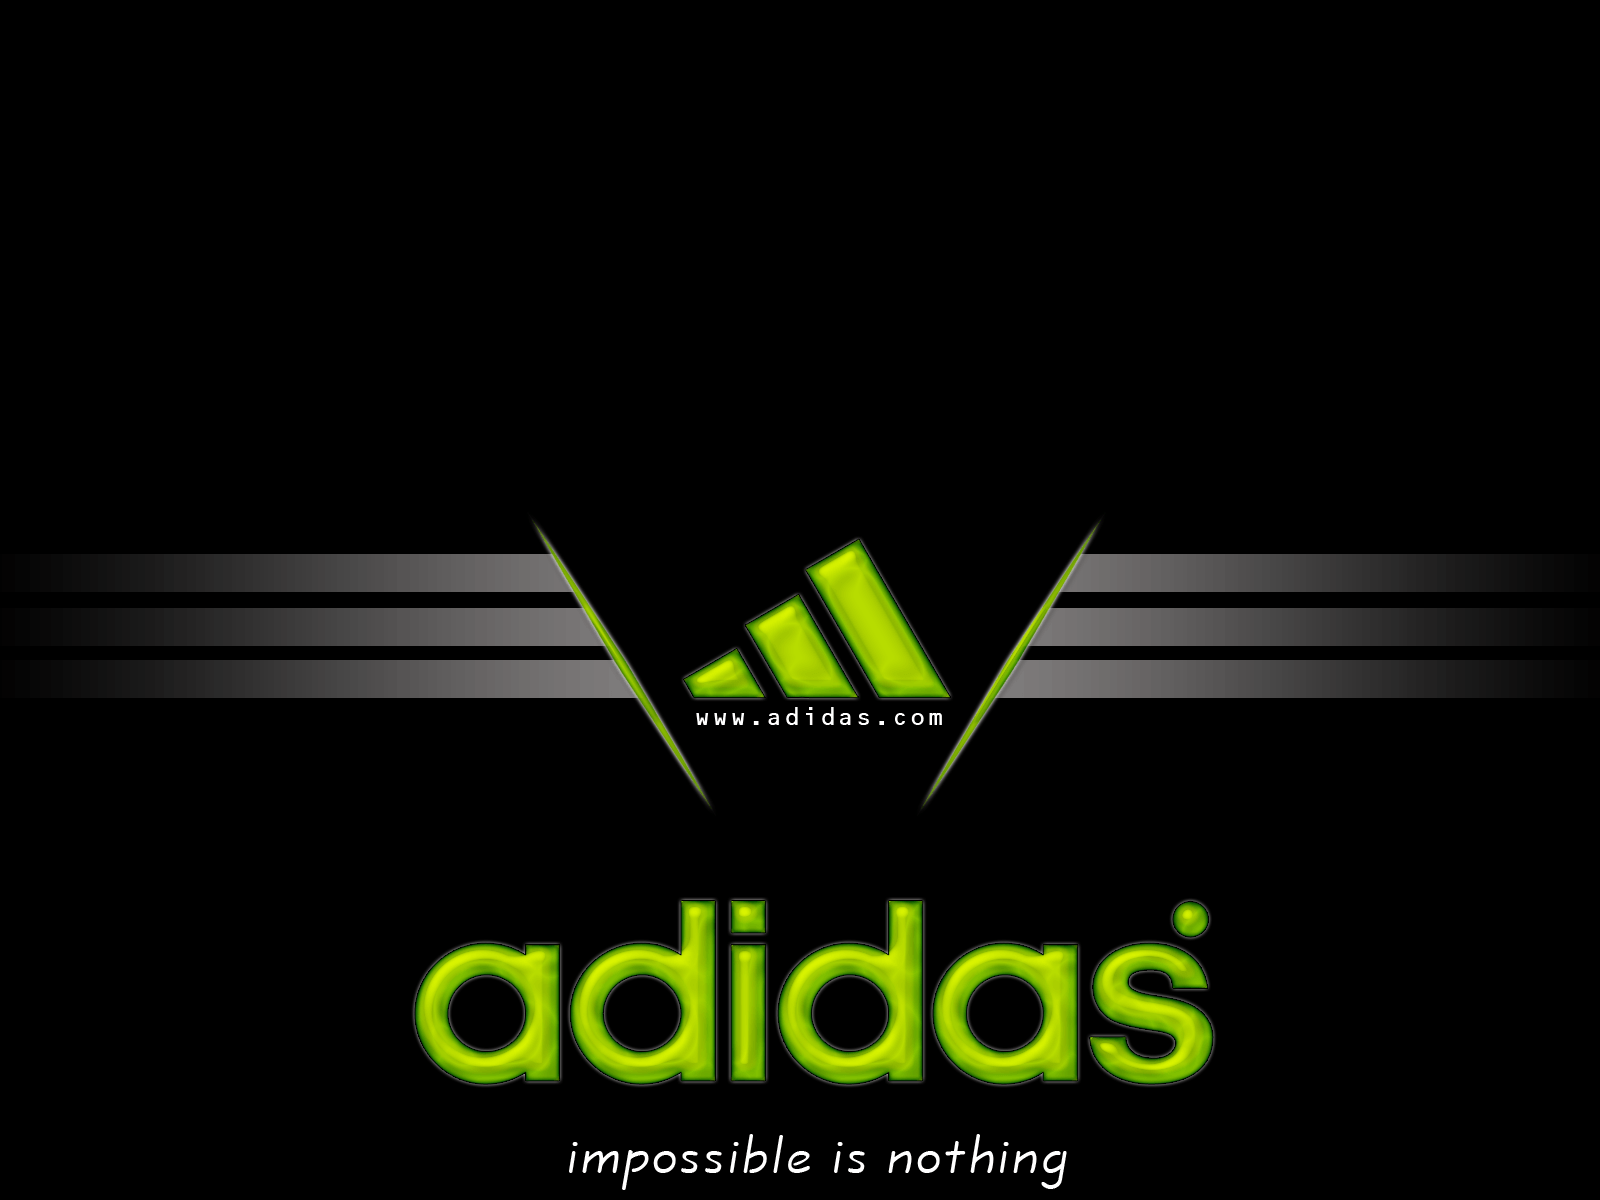 Hd wallpaper adidas - Adidas Wallpapers Wallpaper Cave